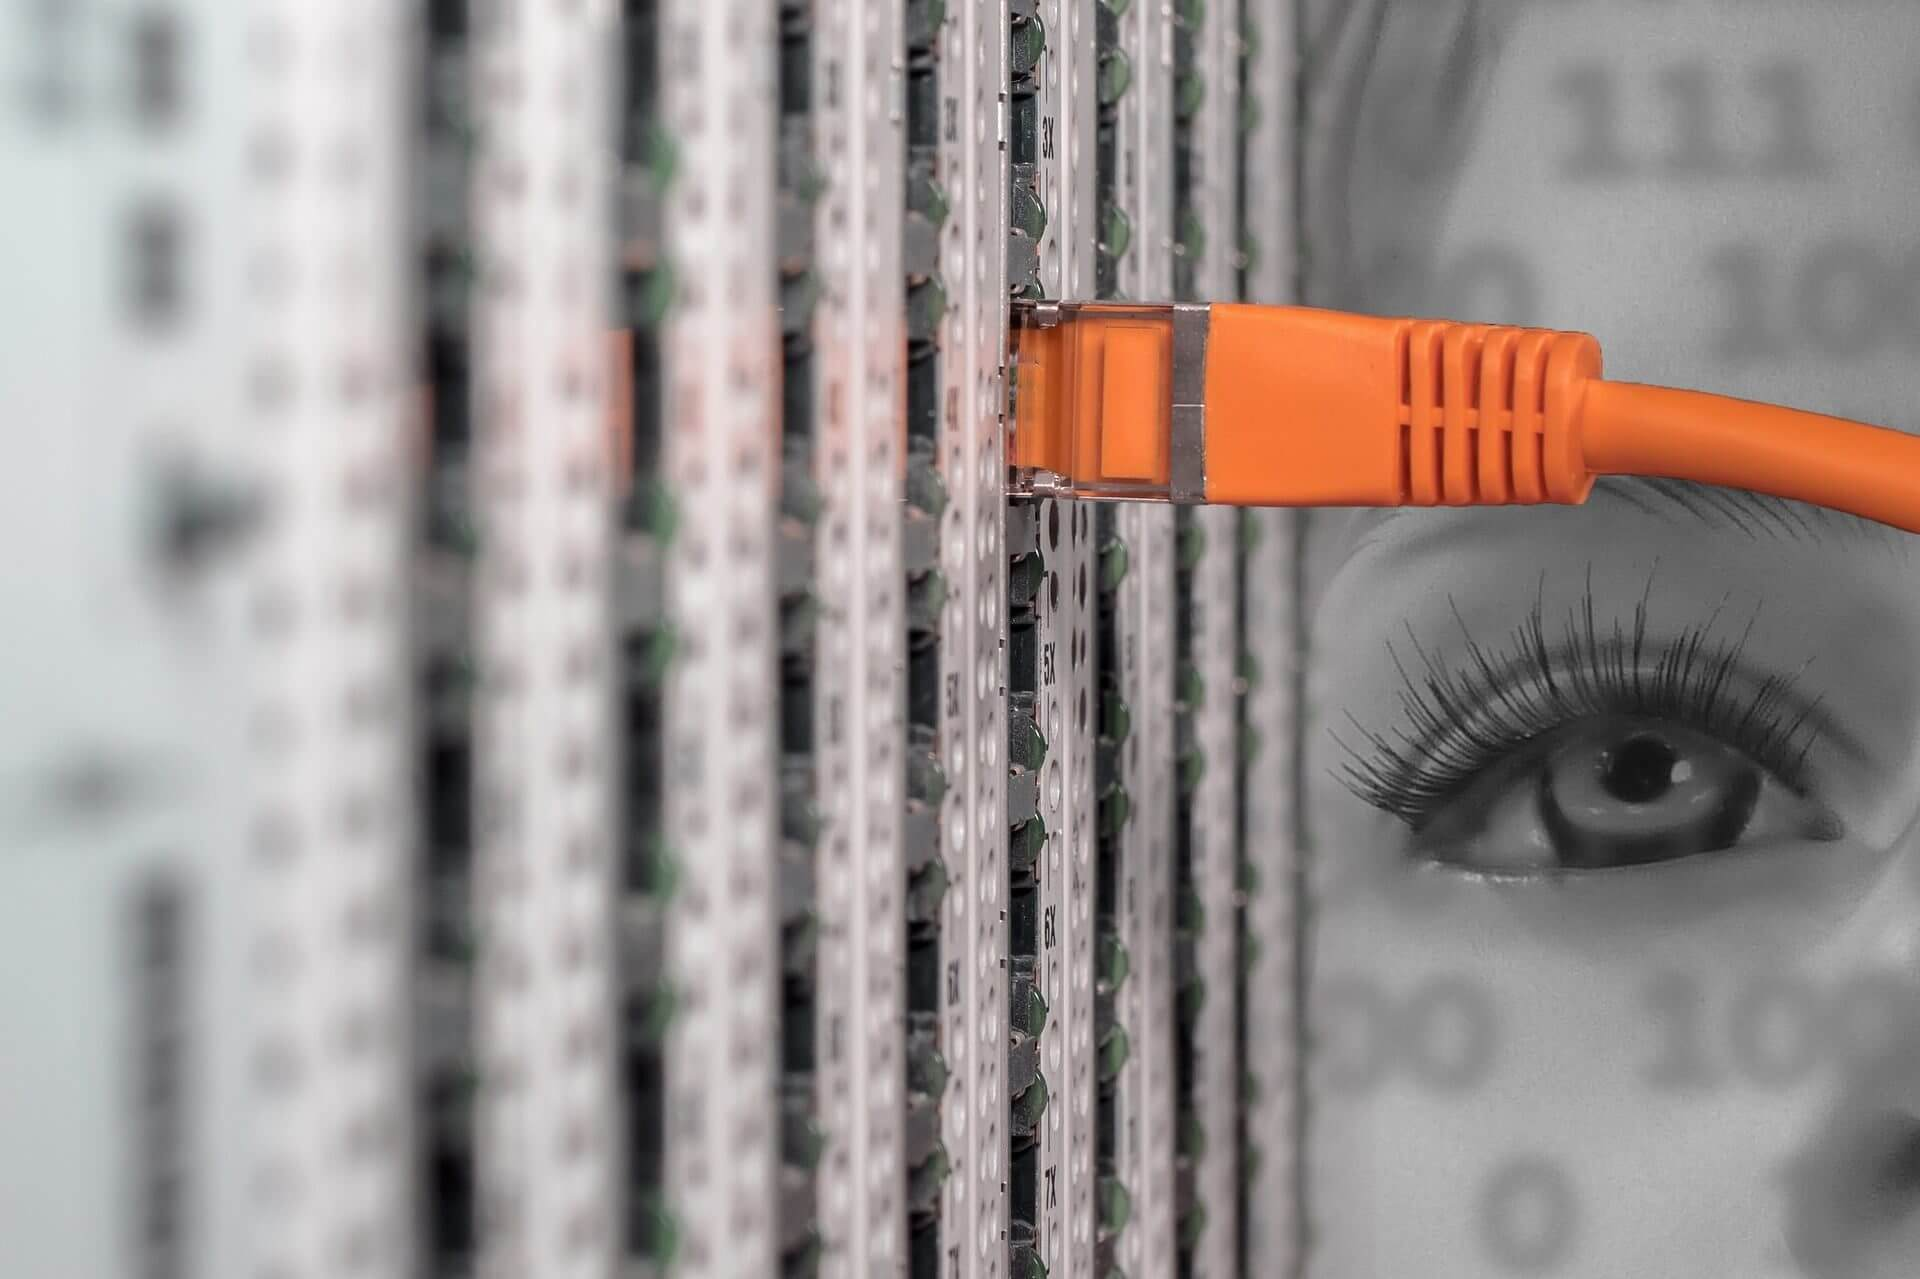 Privacyproof, The Legal Group ondersteunt u hierbij